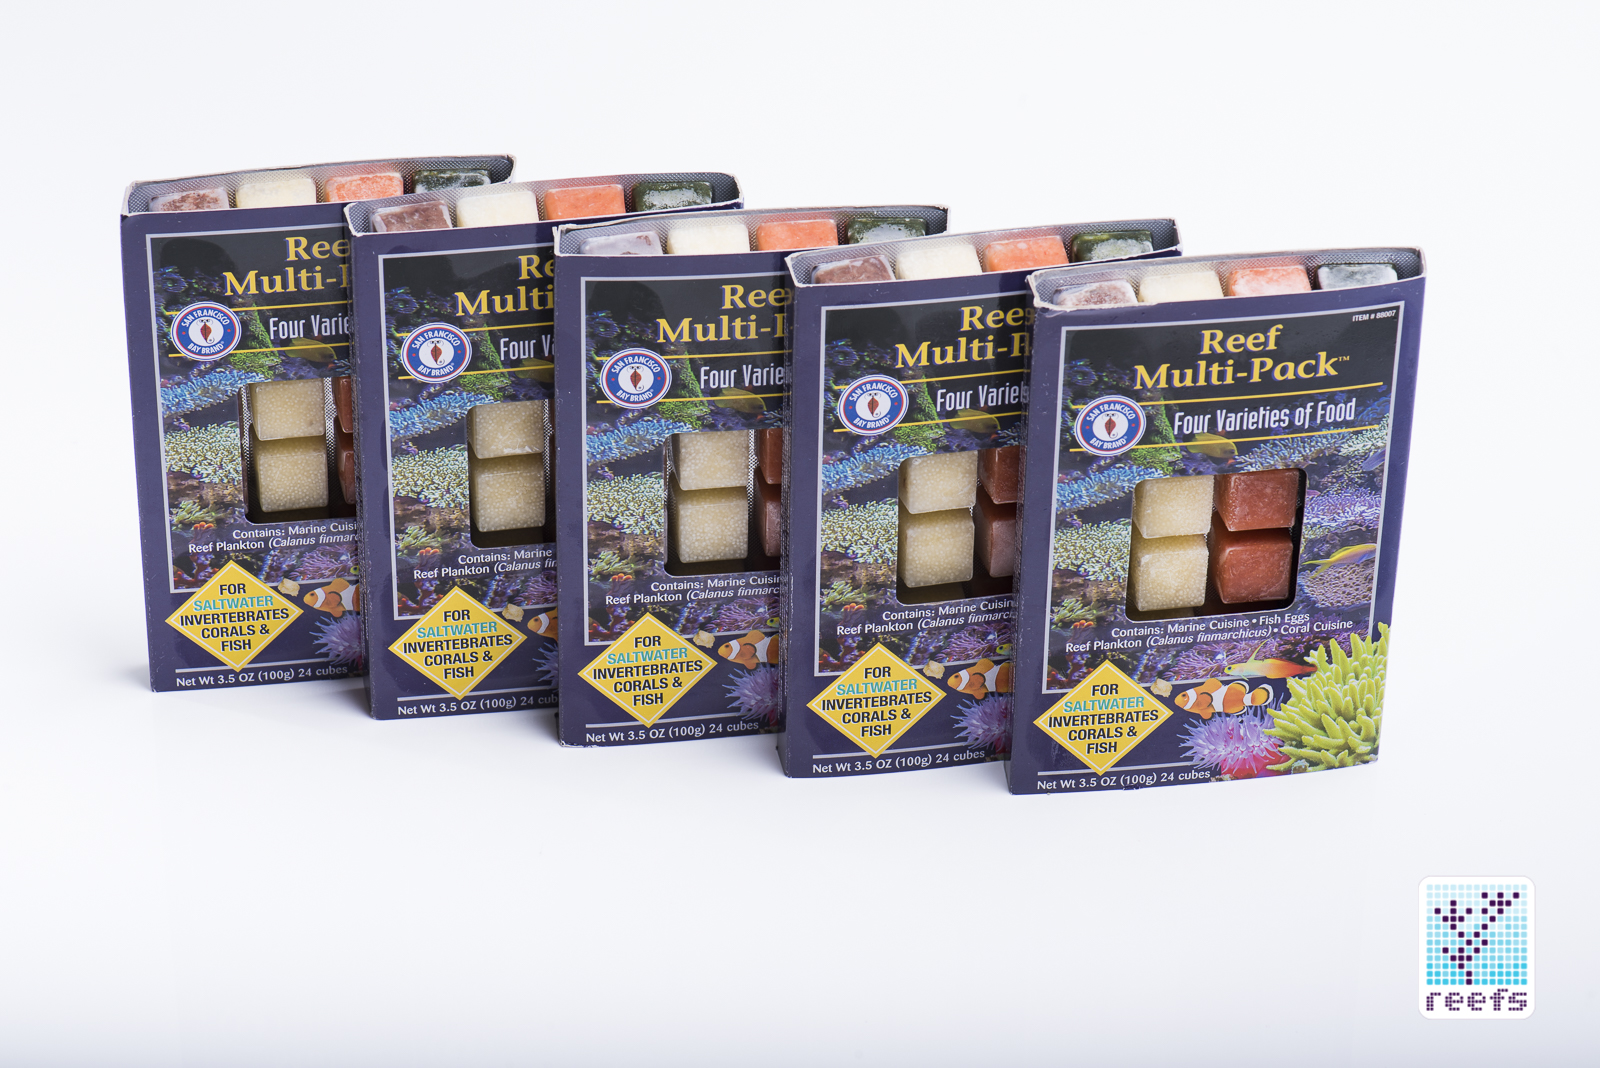 San Francisco Bay Brand Reef Multi-Pack